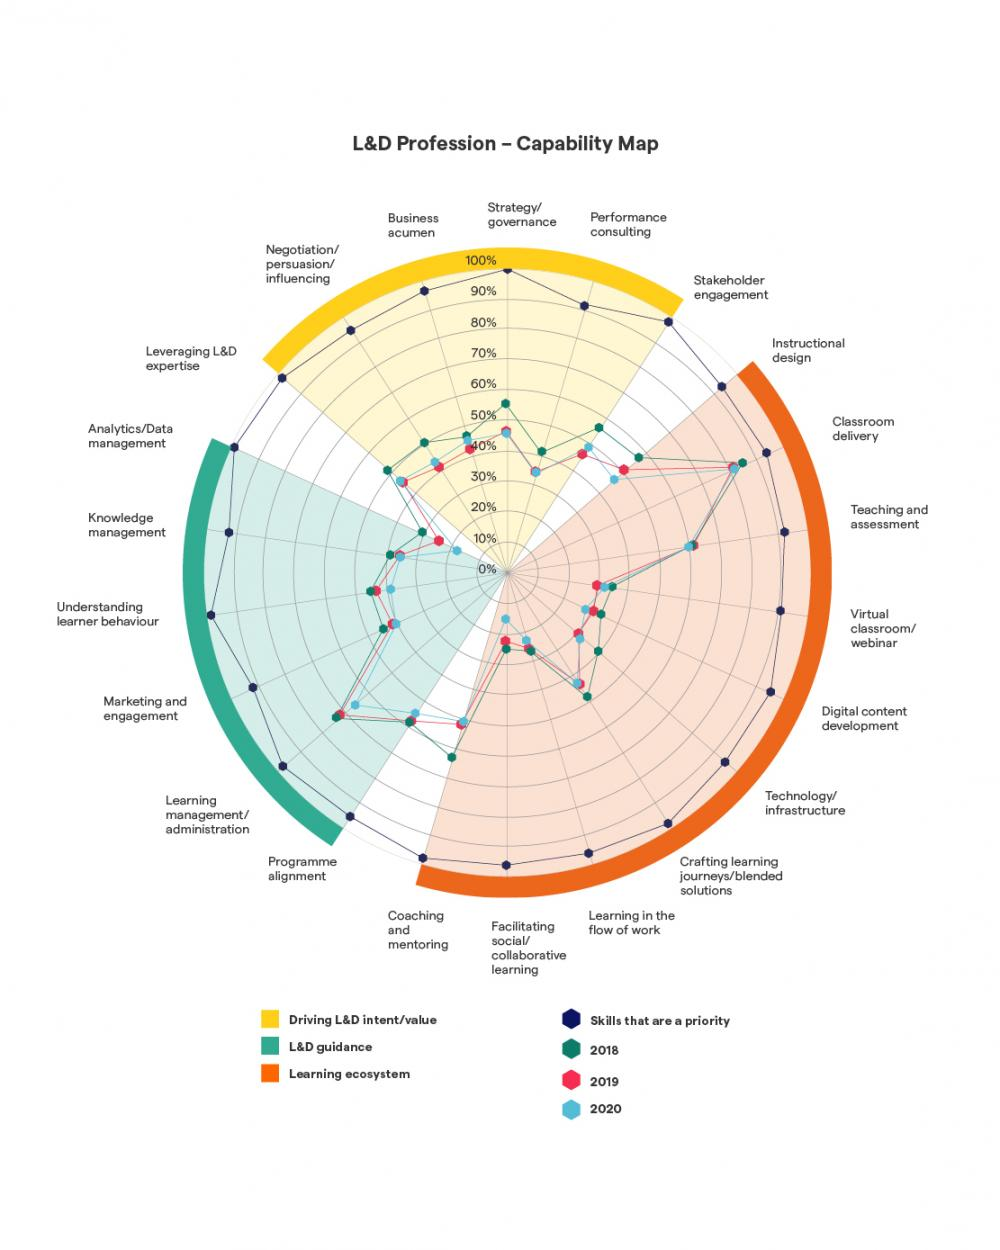 L&D capability map